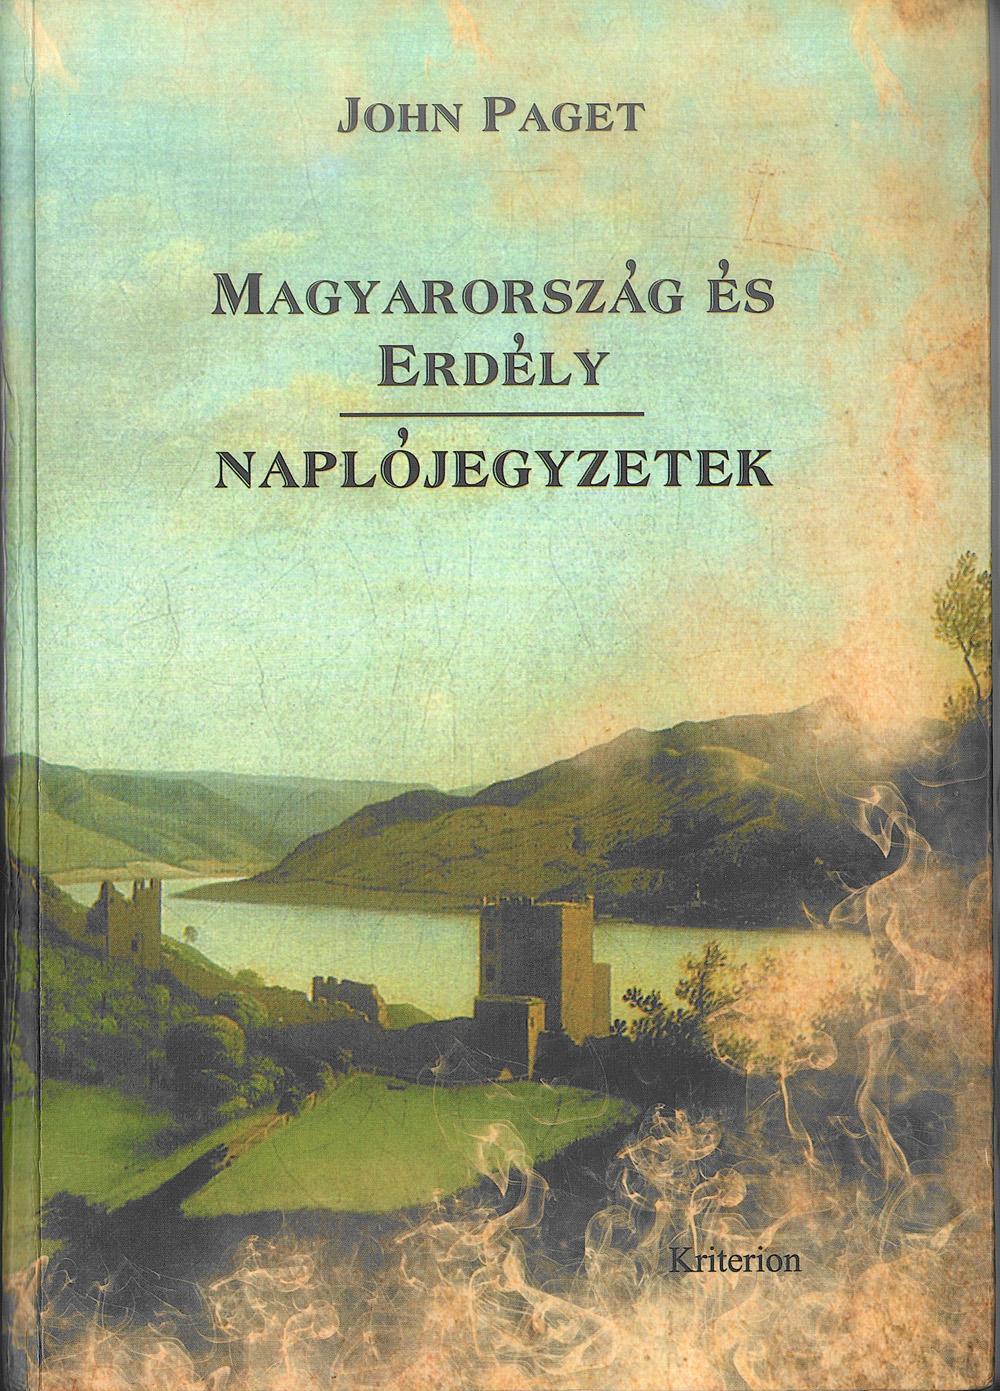 paget_john_magyarorszag_es_erdely_nemzetikonyvtar.jpg